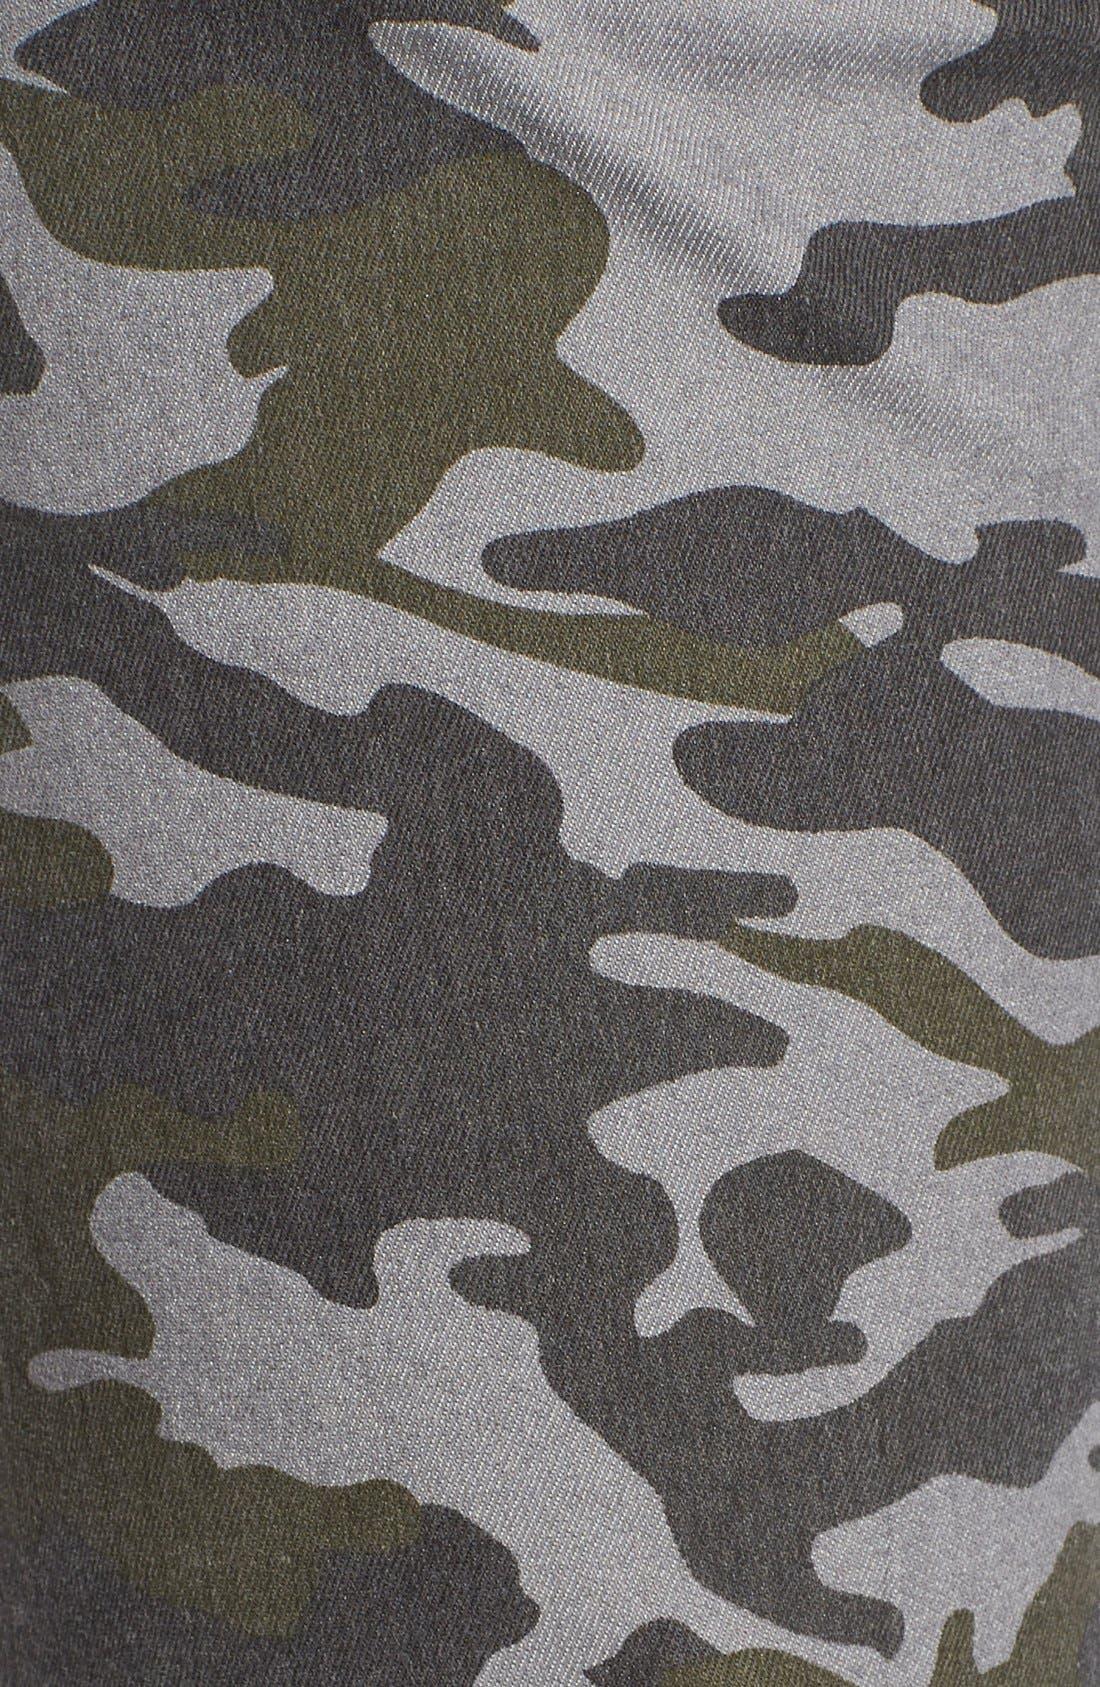 Camo Print Cargo Pants,                             Alternate thumbnail 4, color,                             317